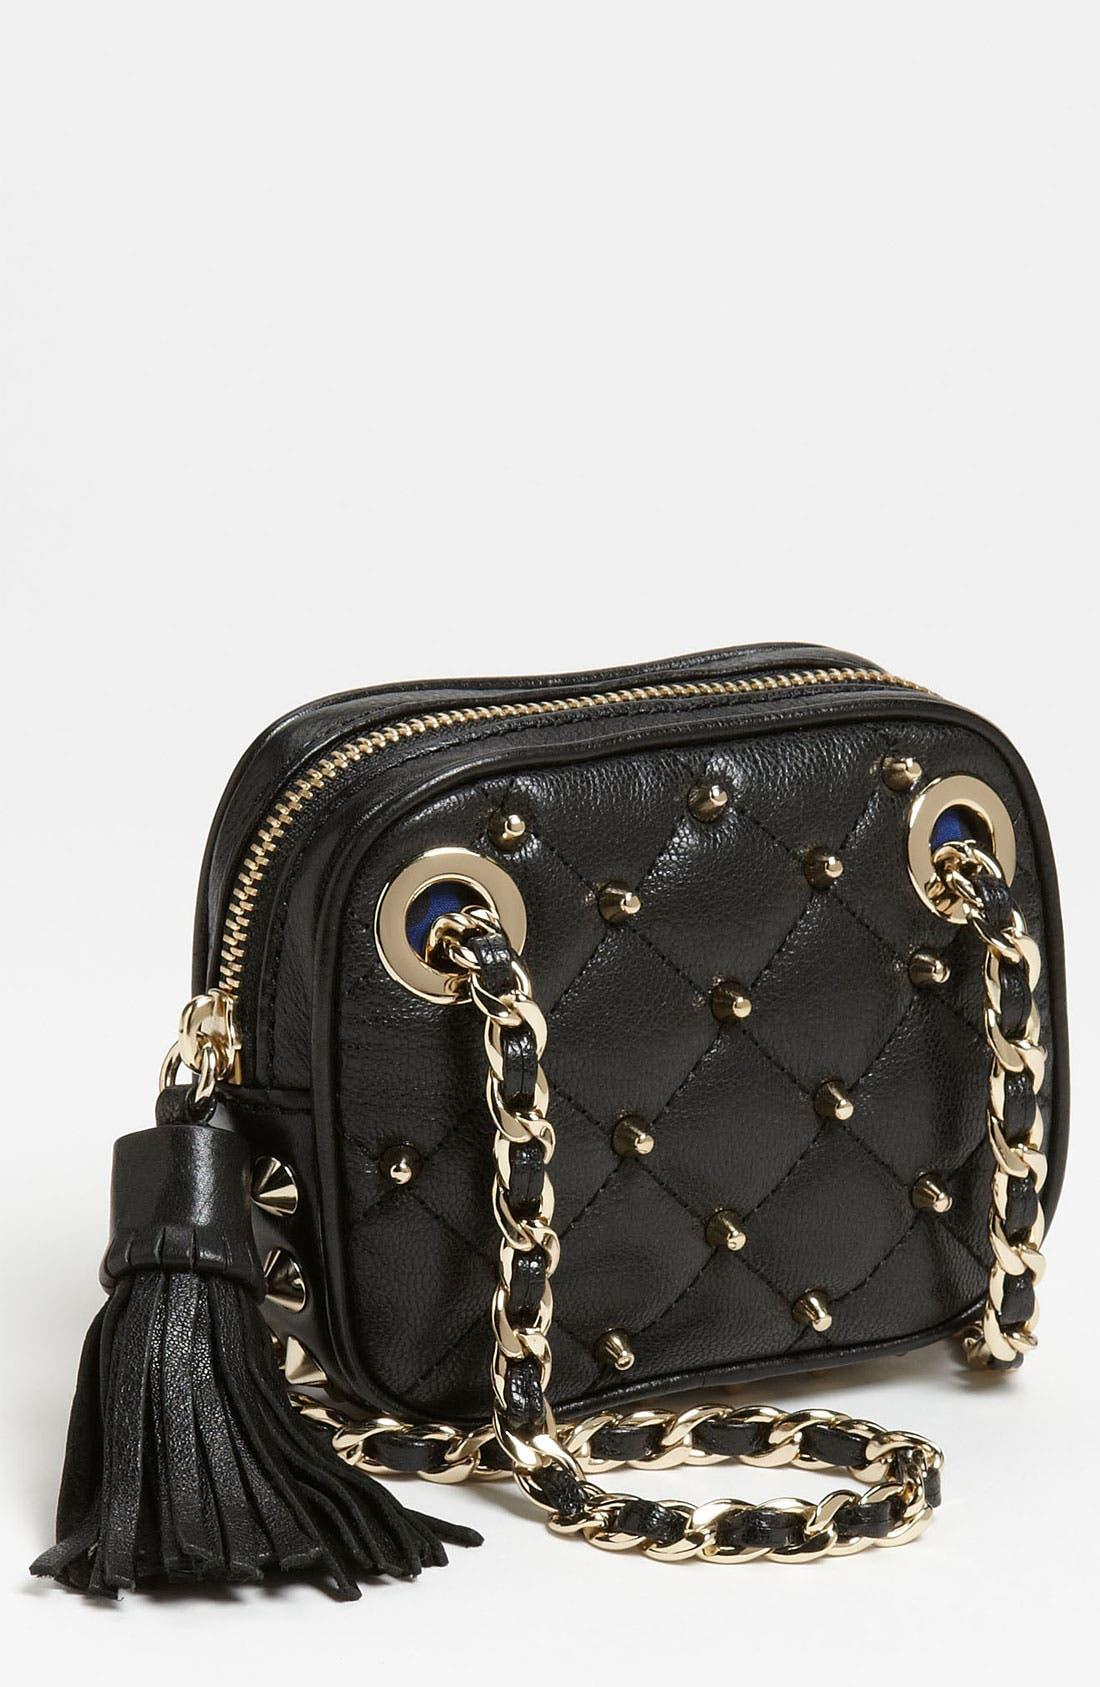 Alternate Image 1 Selected - Rebecca Minkoff 'Mini Flirty' Crossbody Bag